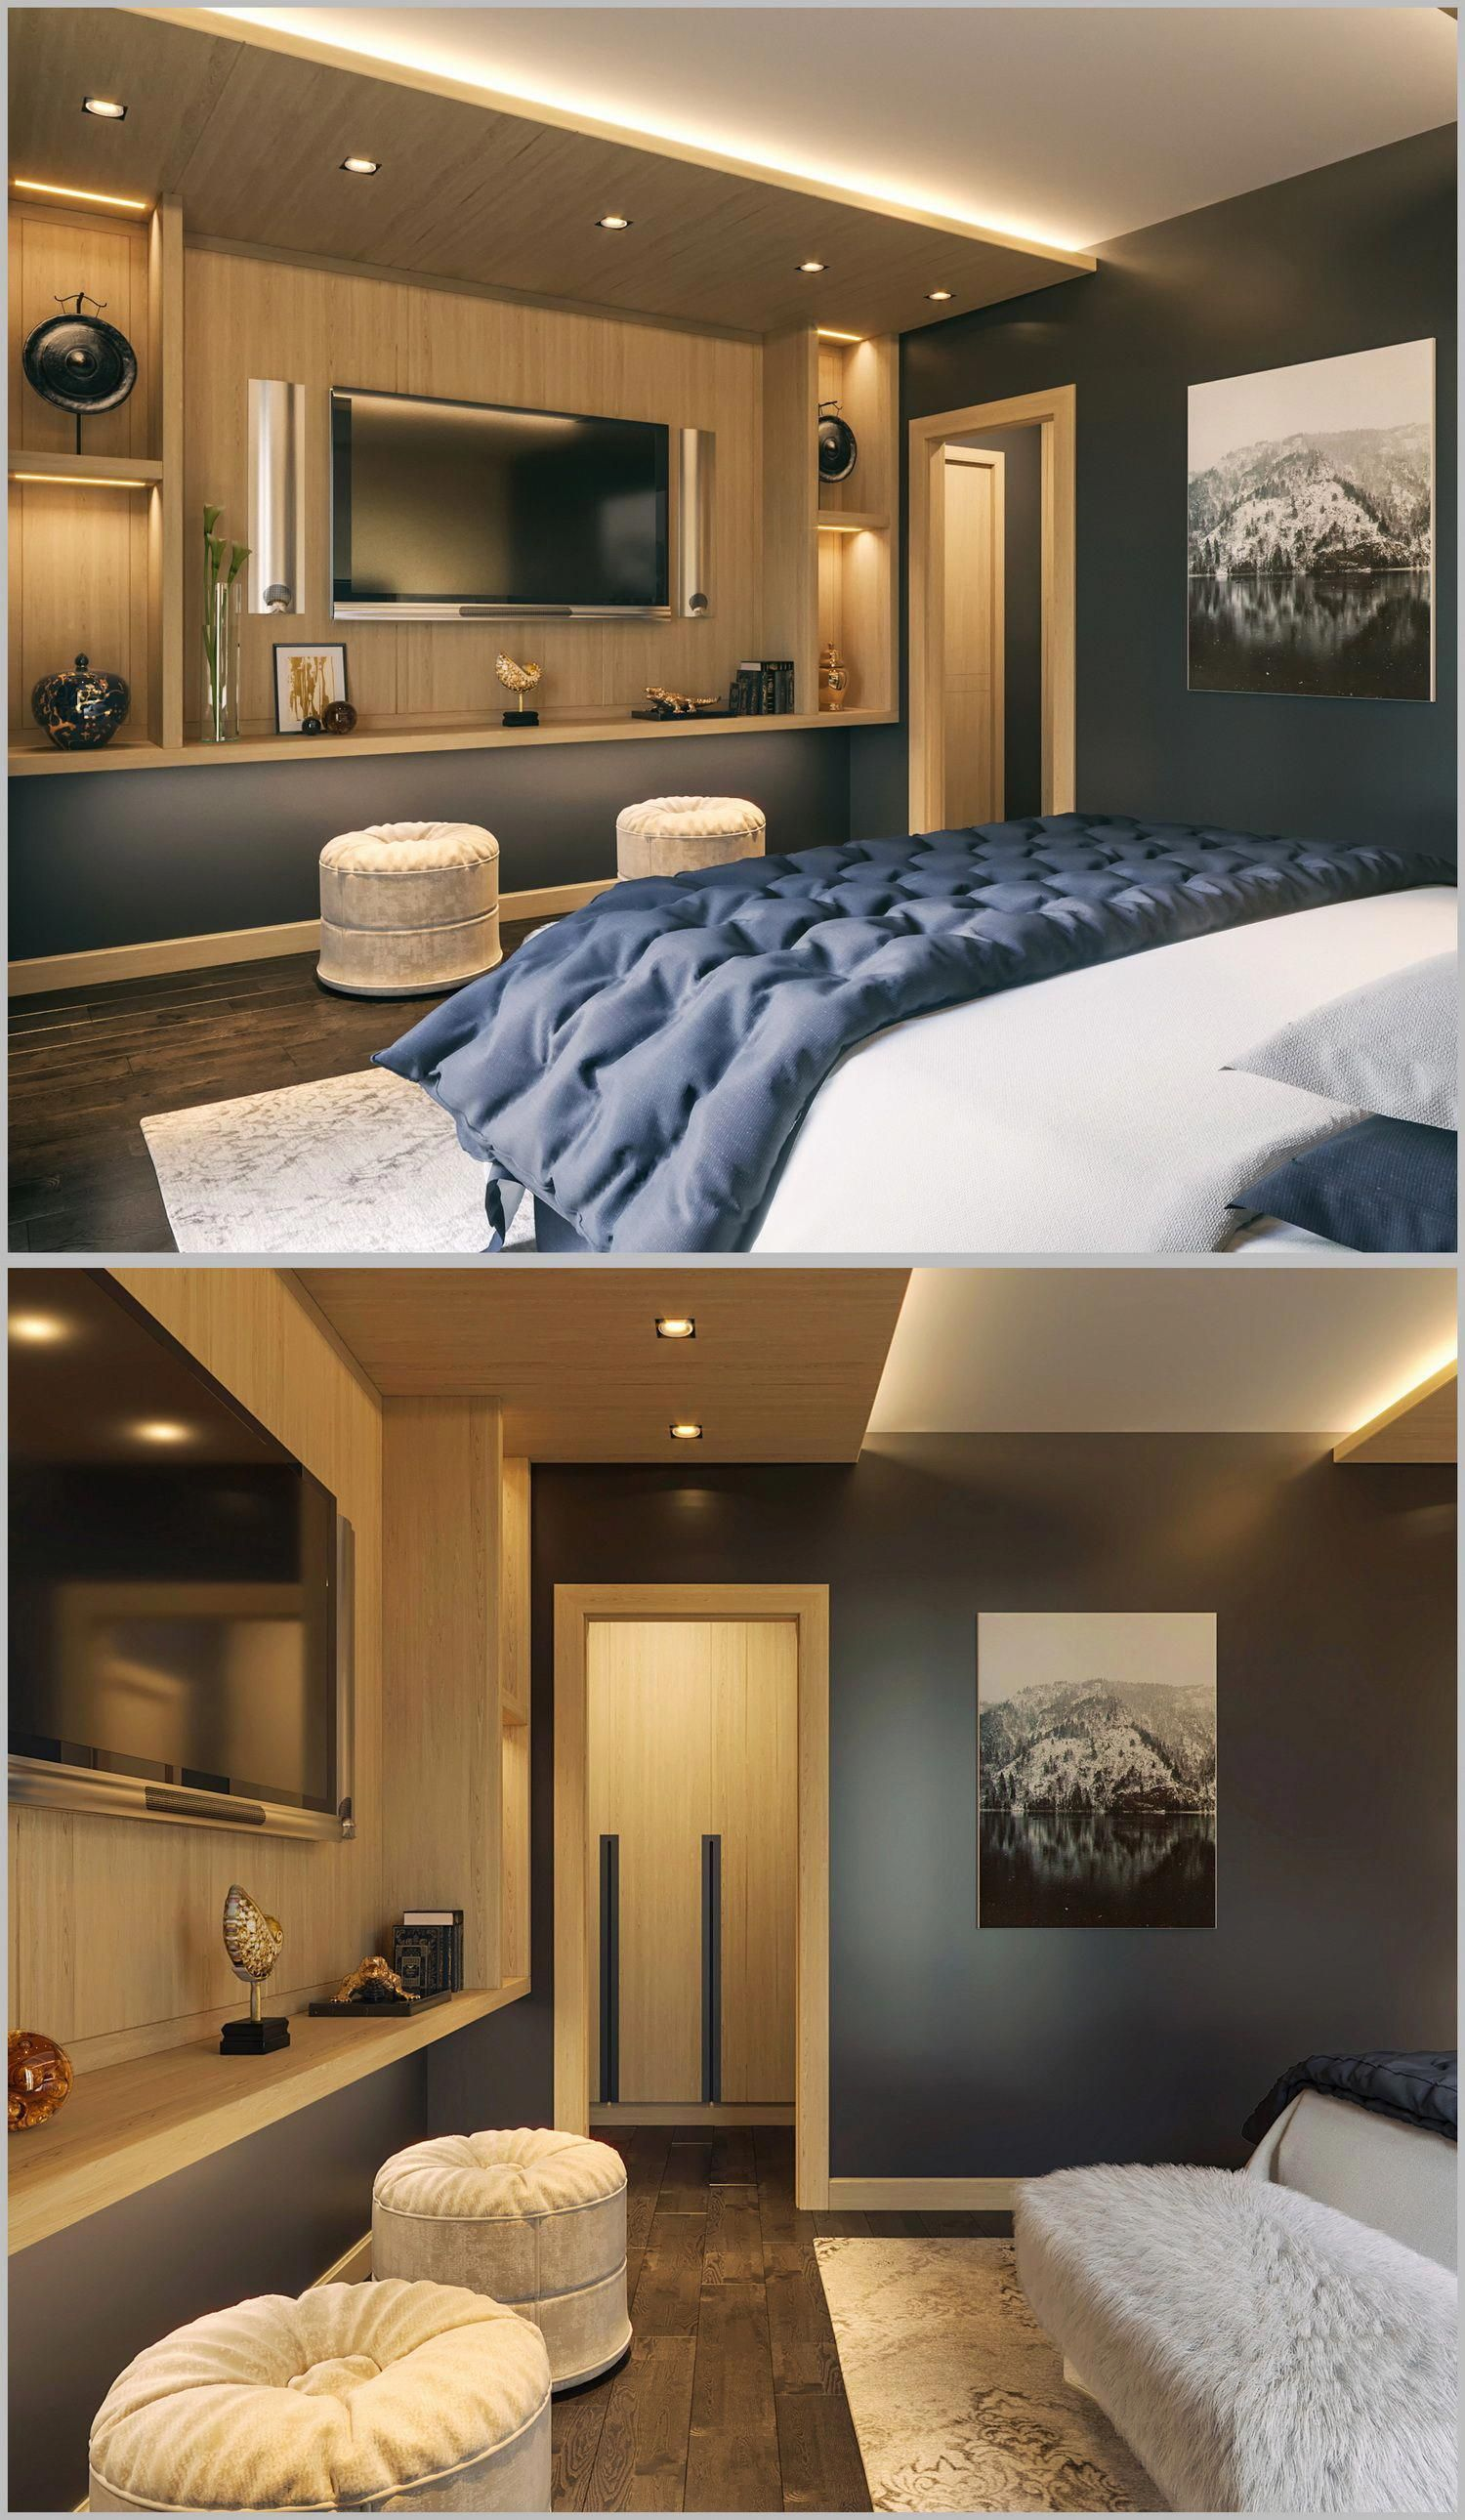 10x10 Bedroom Arrangement: Pin Em Habitación Principal